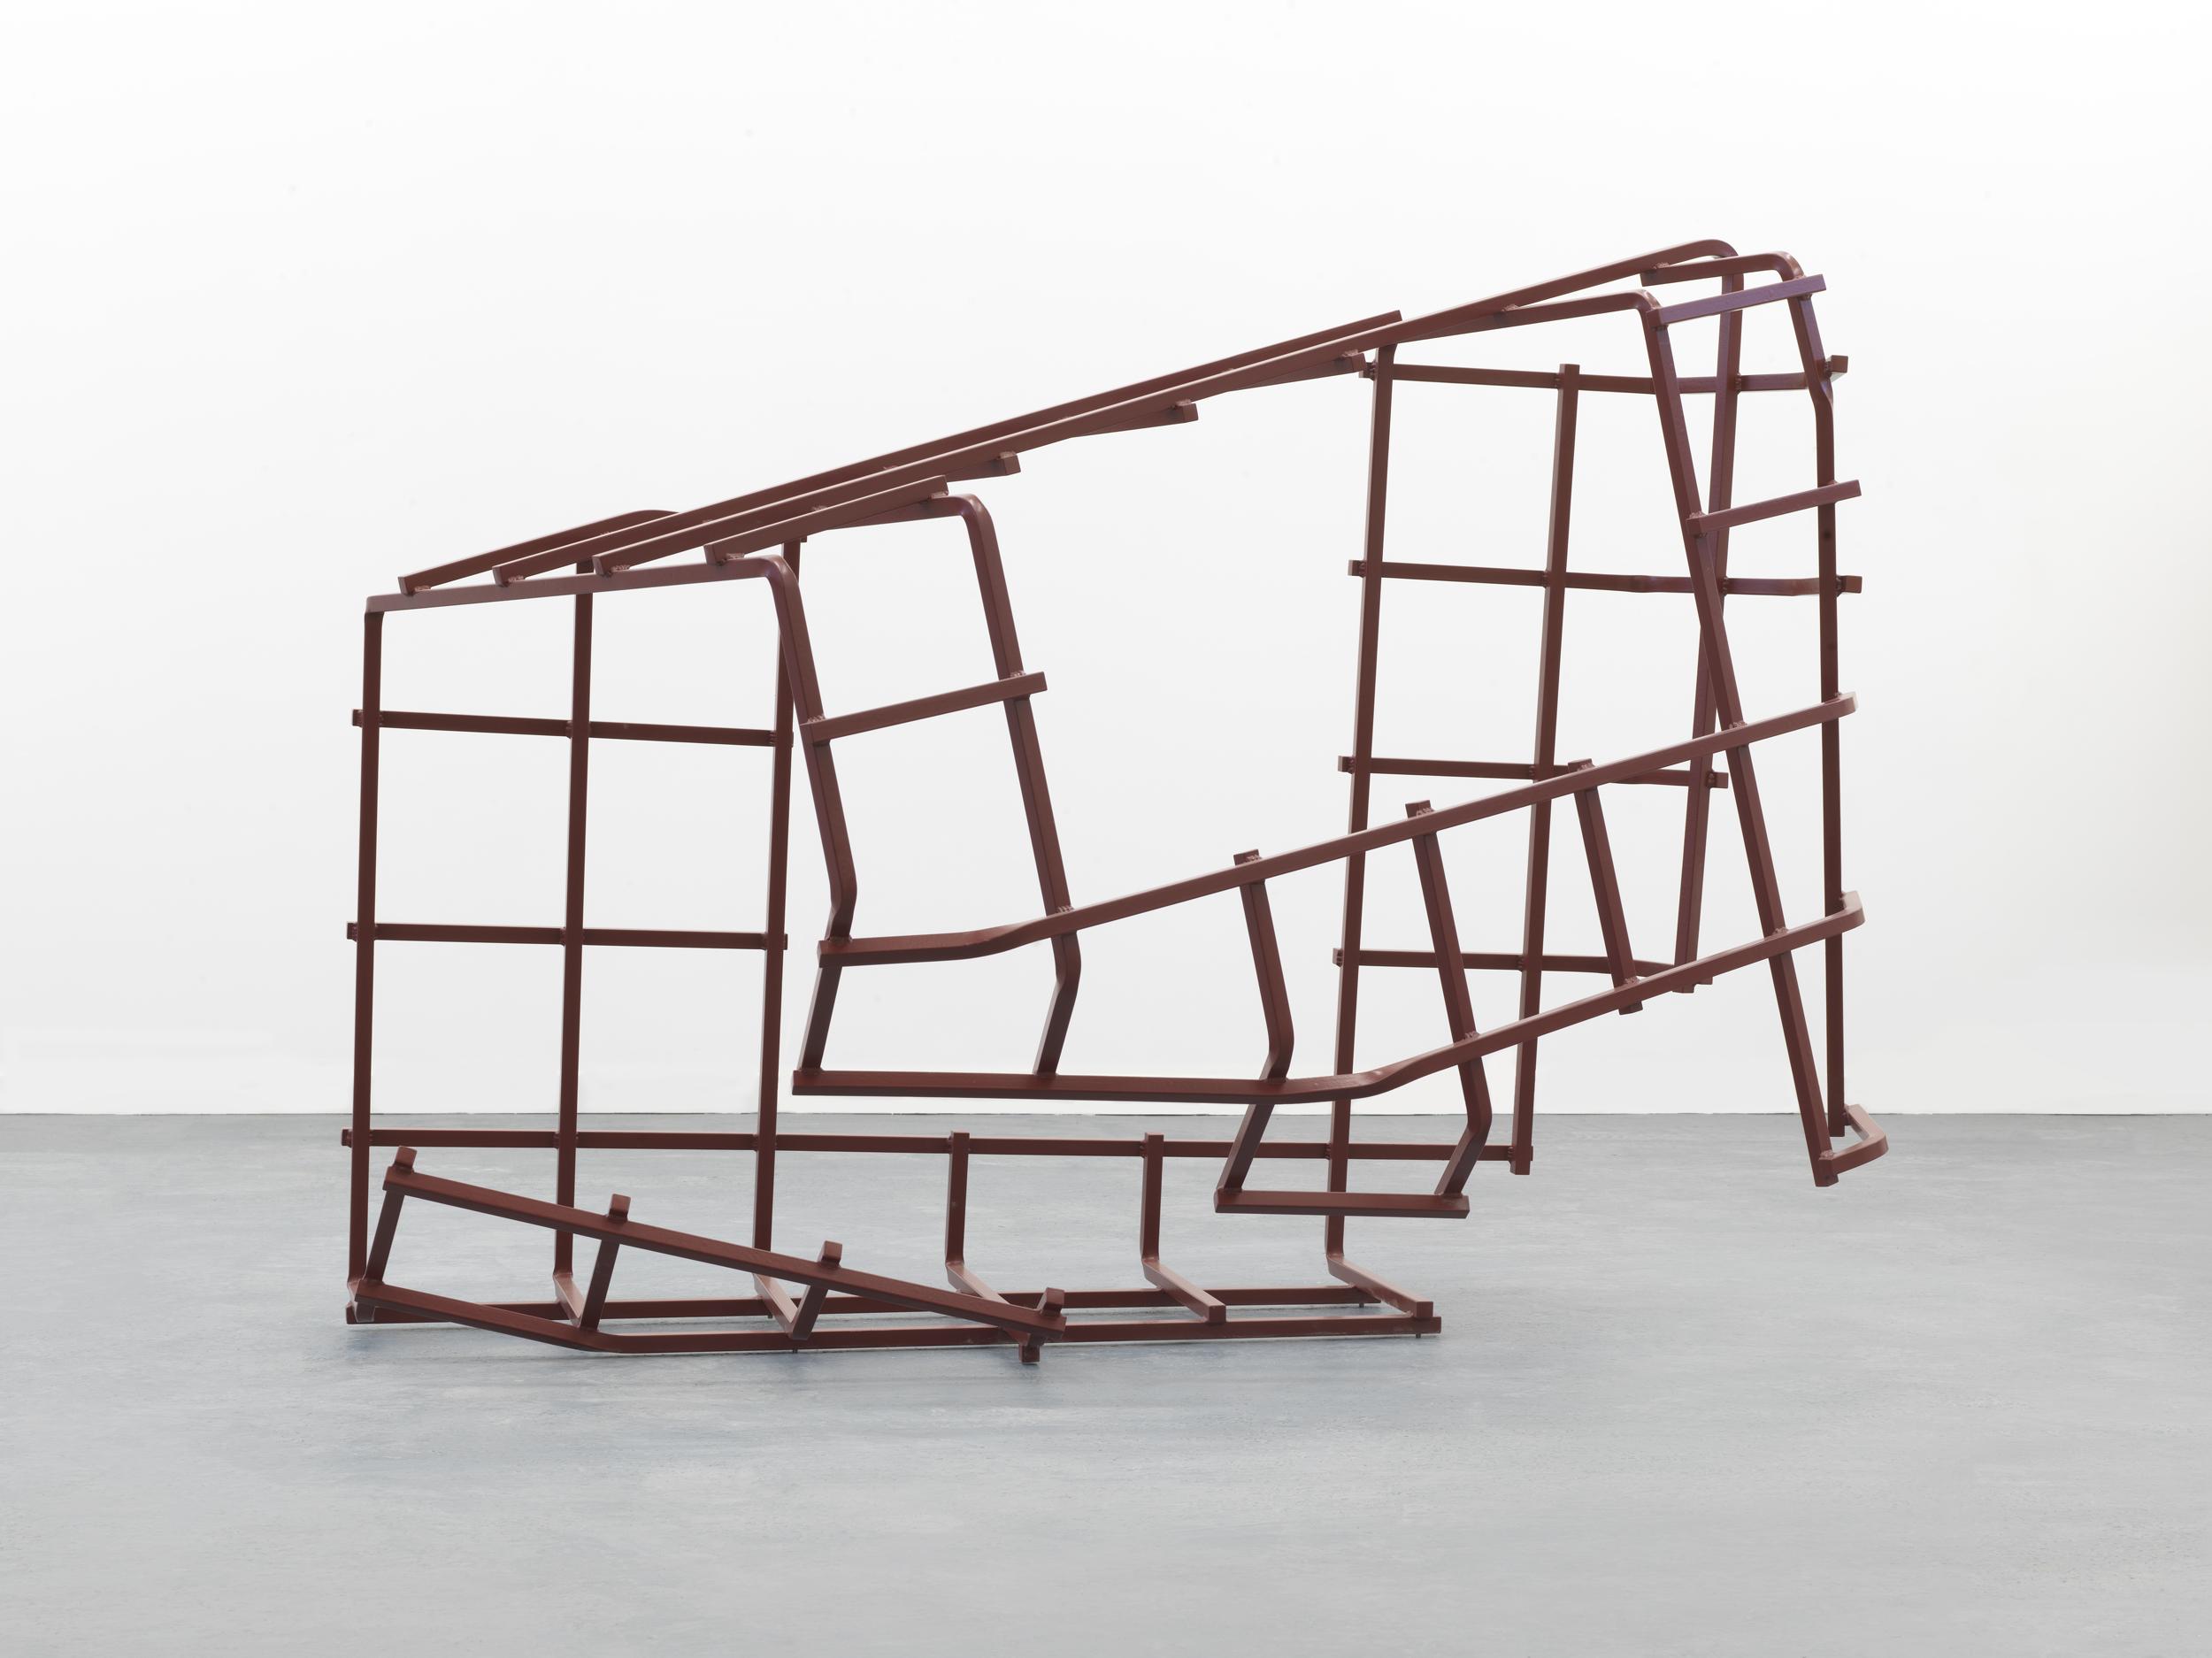 Form of Shape, 2018, 130 x 110 x 85 cm